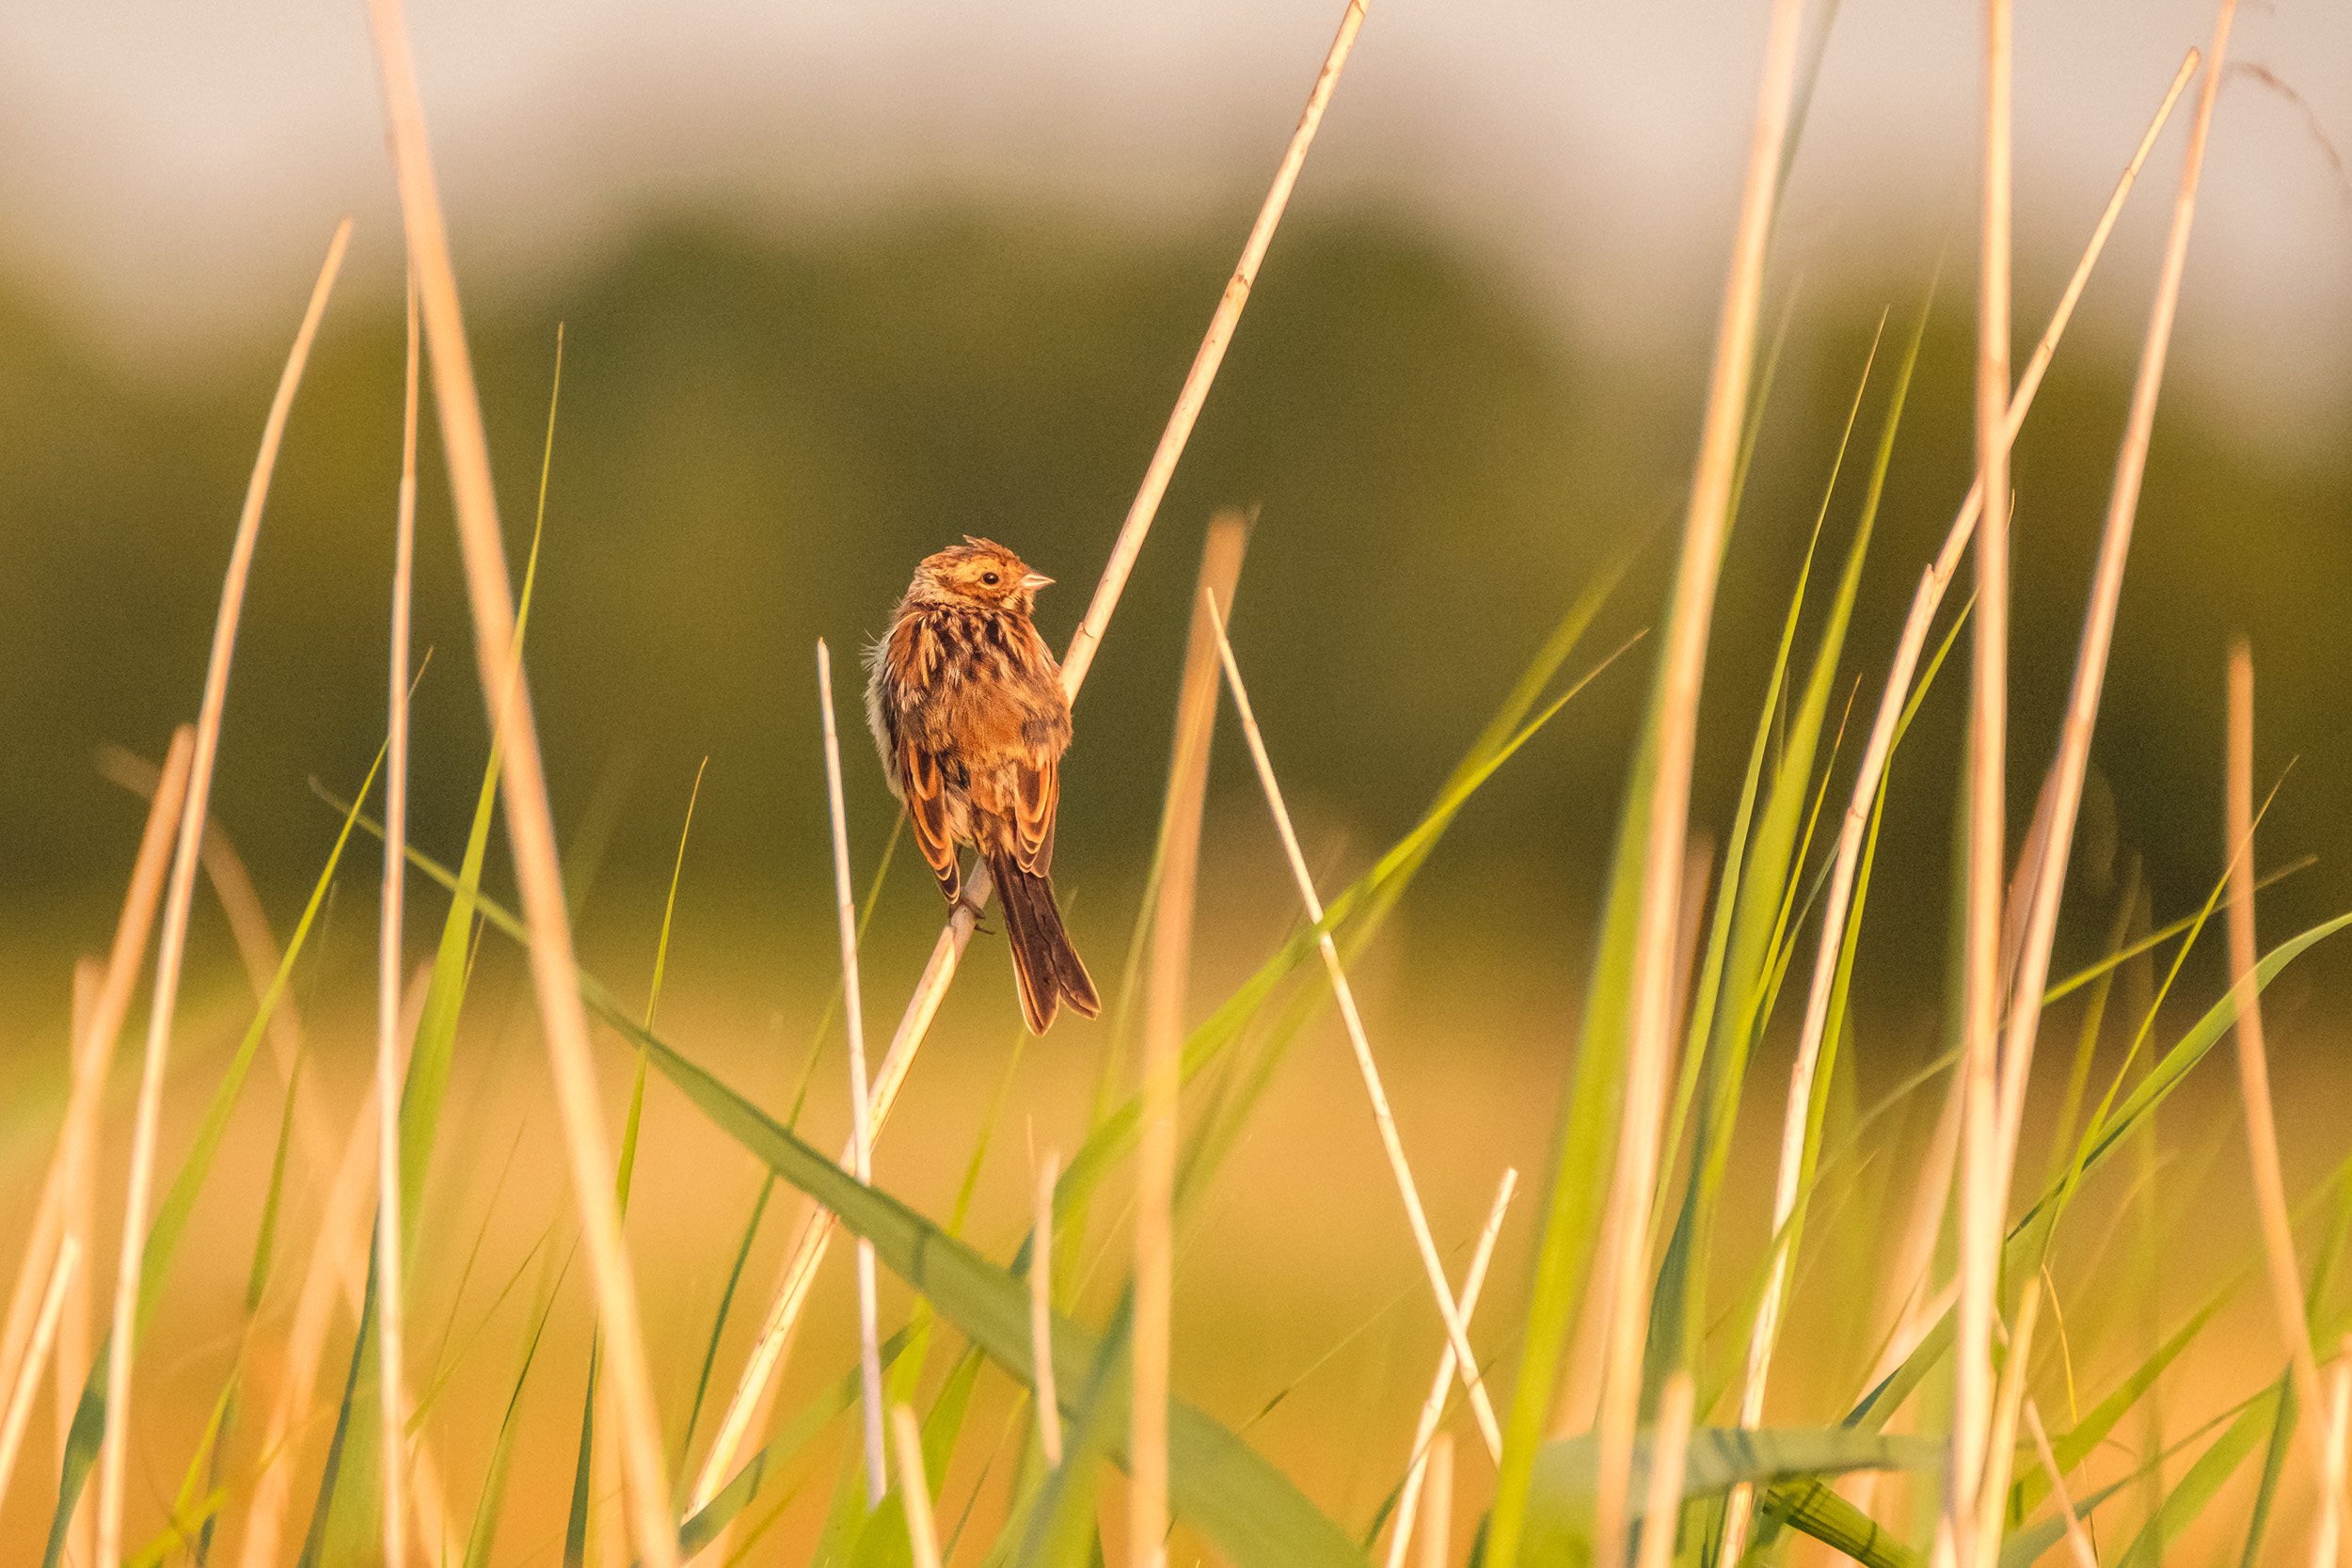 juvenile Common reed bunting (jonge Rietgors)